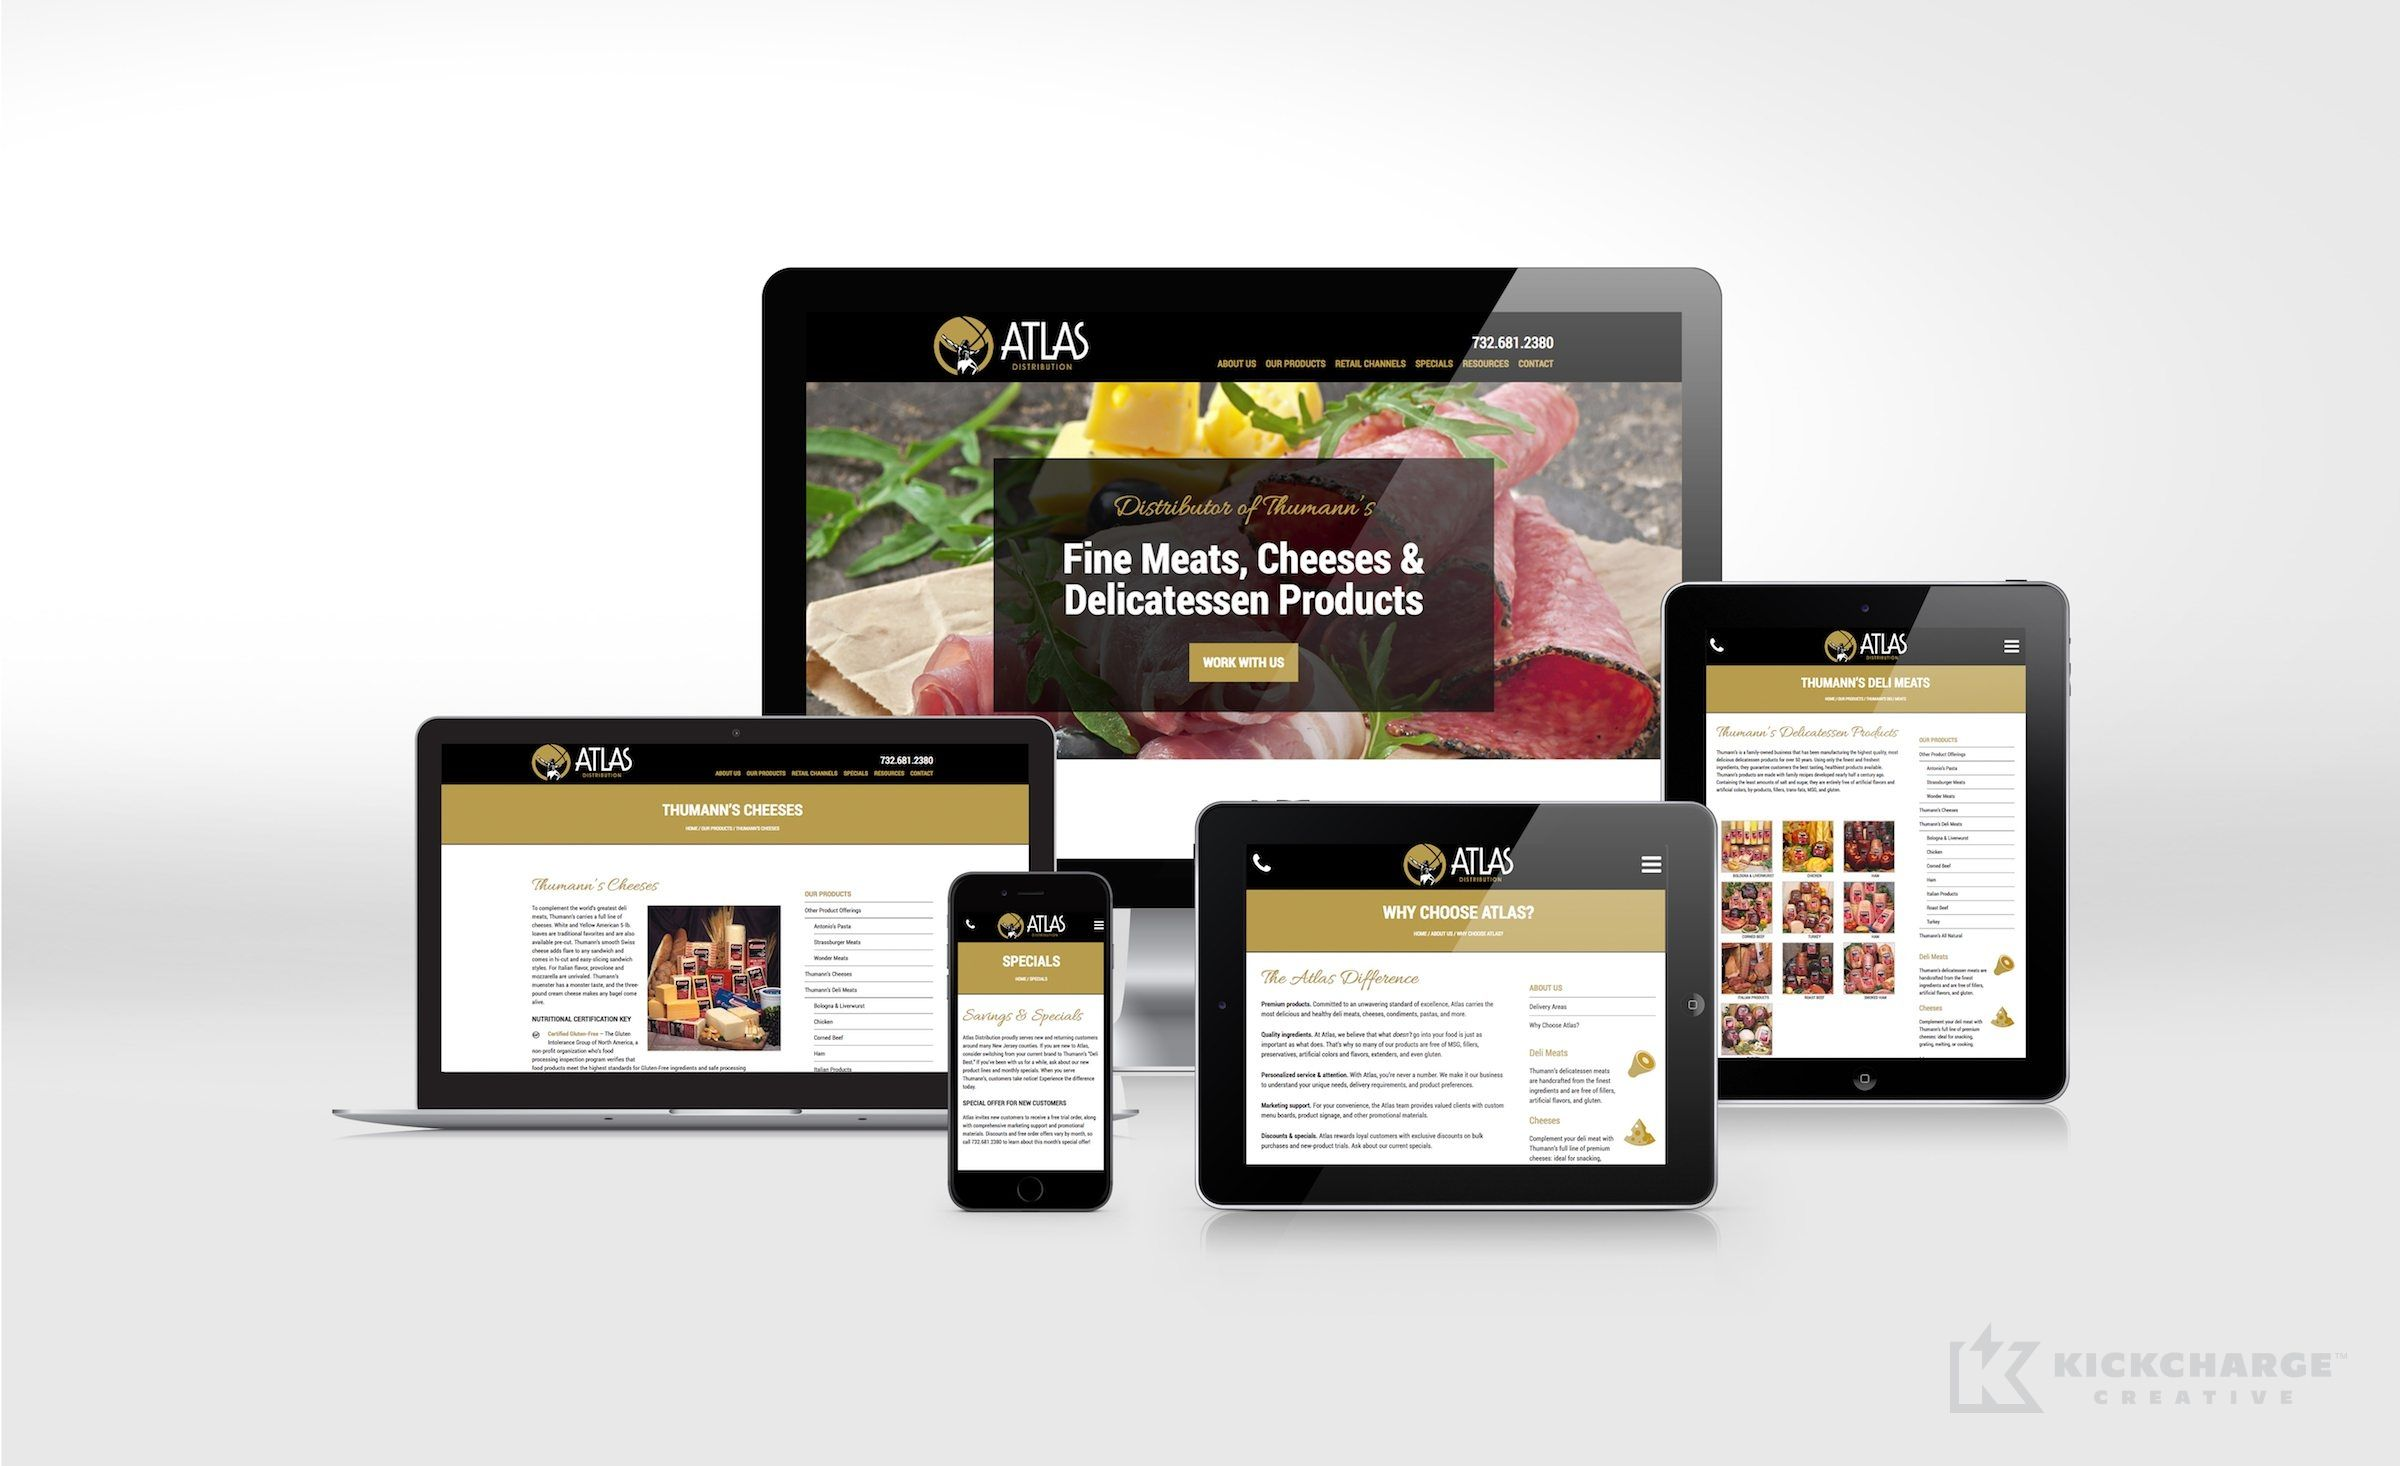 Website Design And Development For Atlas Distribution Nj Advertising Agency Nj Ad Agency Nj Web Design Nj Logo Design Portfolio Web Design Atlas Digital